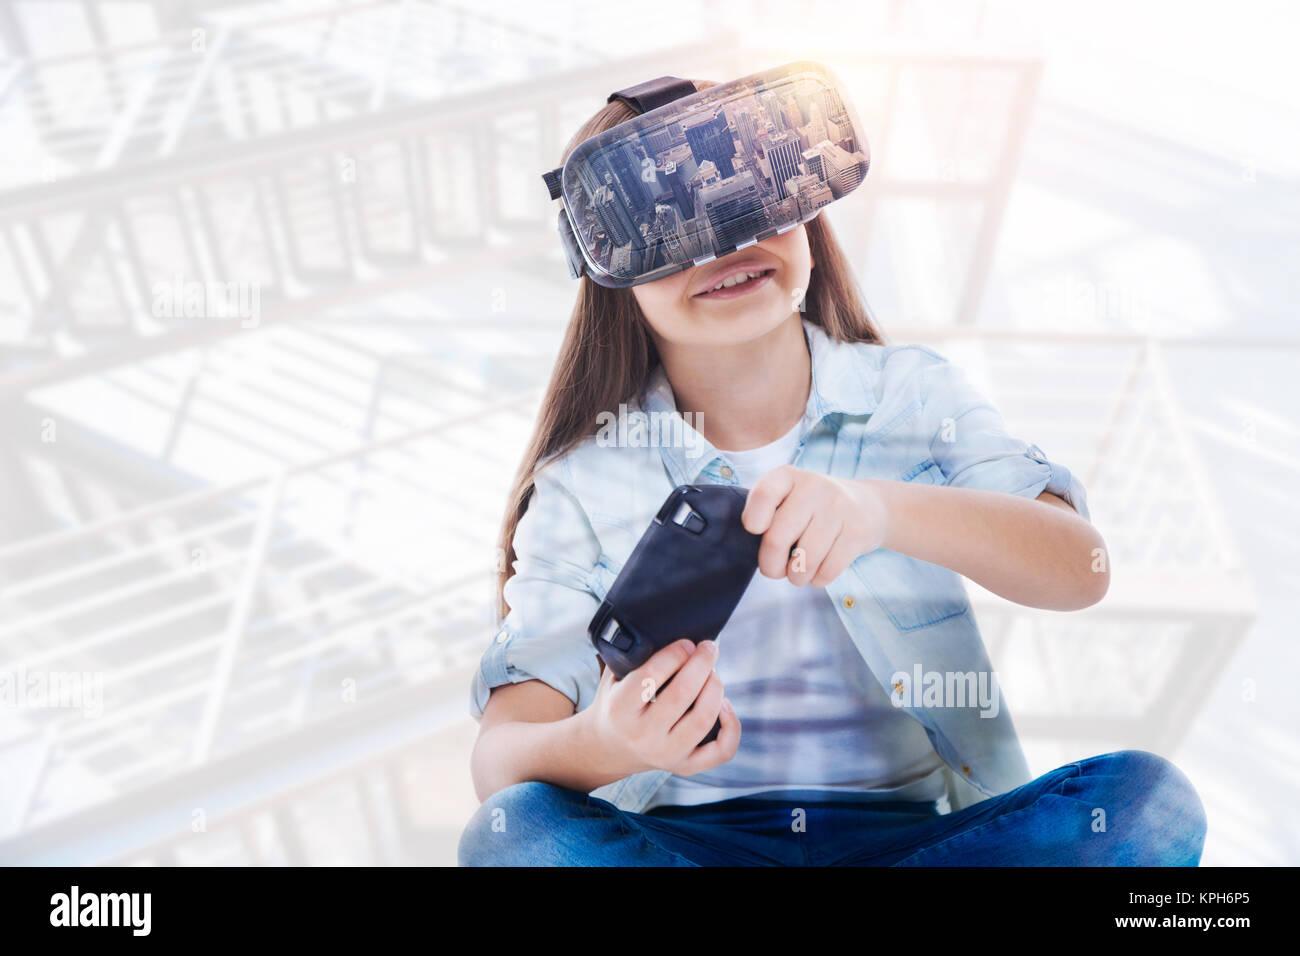 19d28e0e074 Vigorous optimistic girl playing in VR game - Stock Image